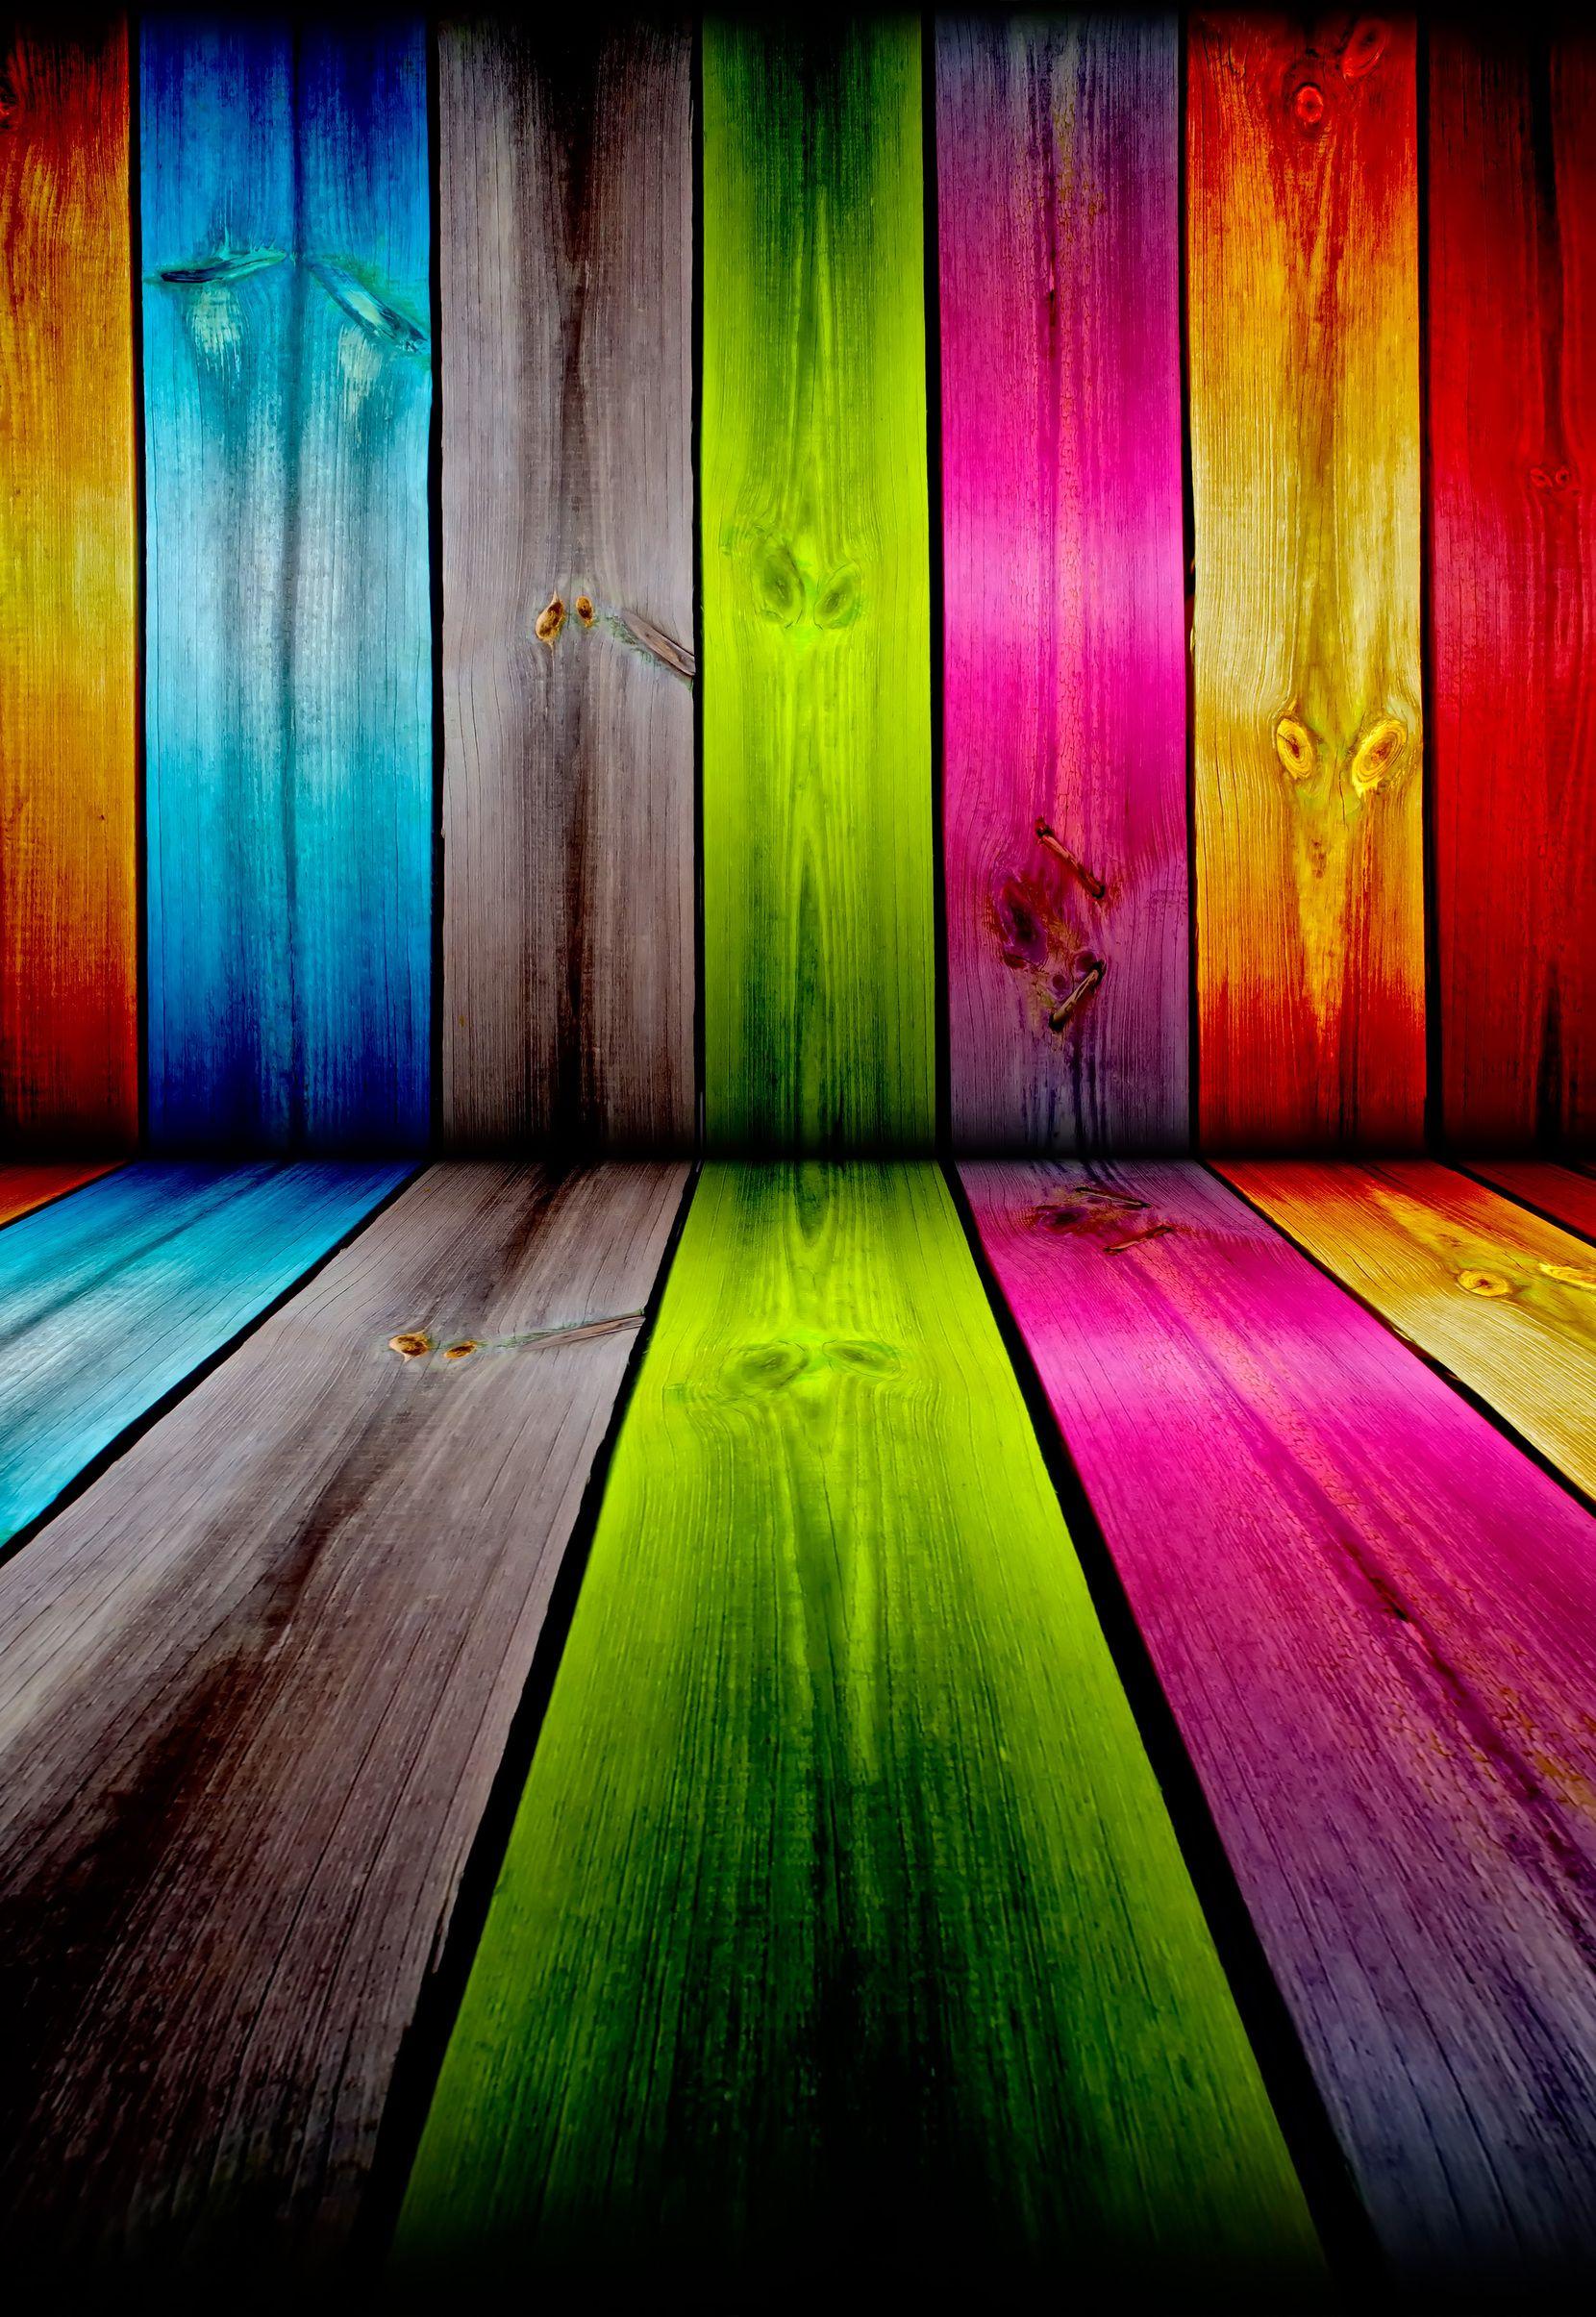 Rainbow Wall Wood Neon Paint | GAY COLORS | Pinterest ...